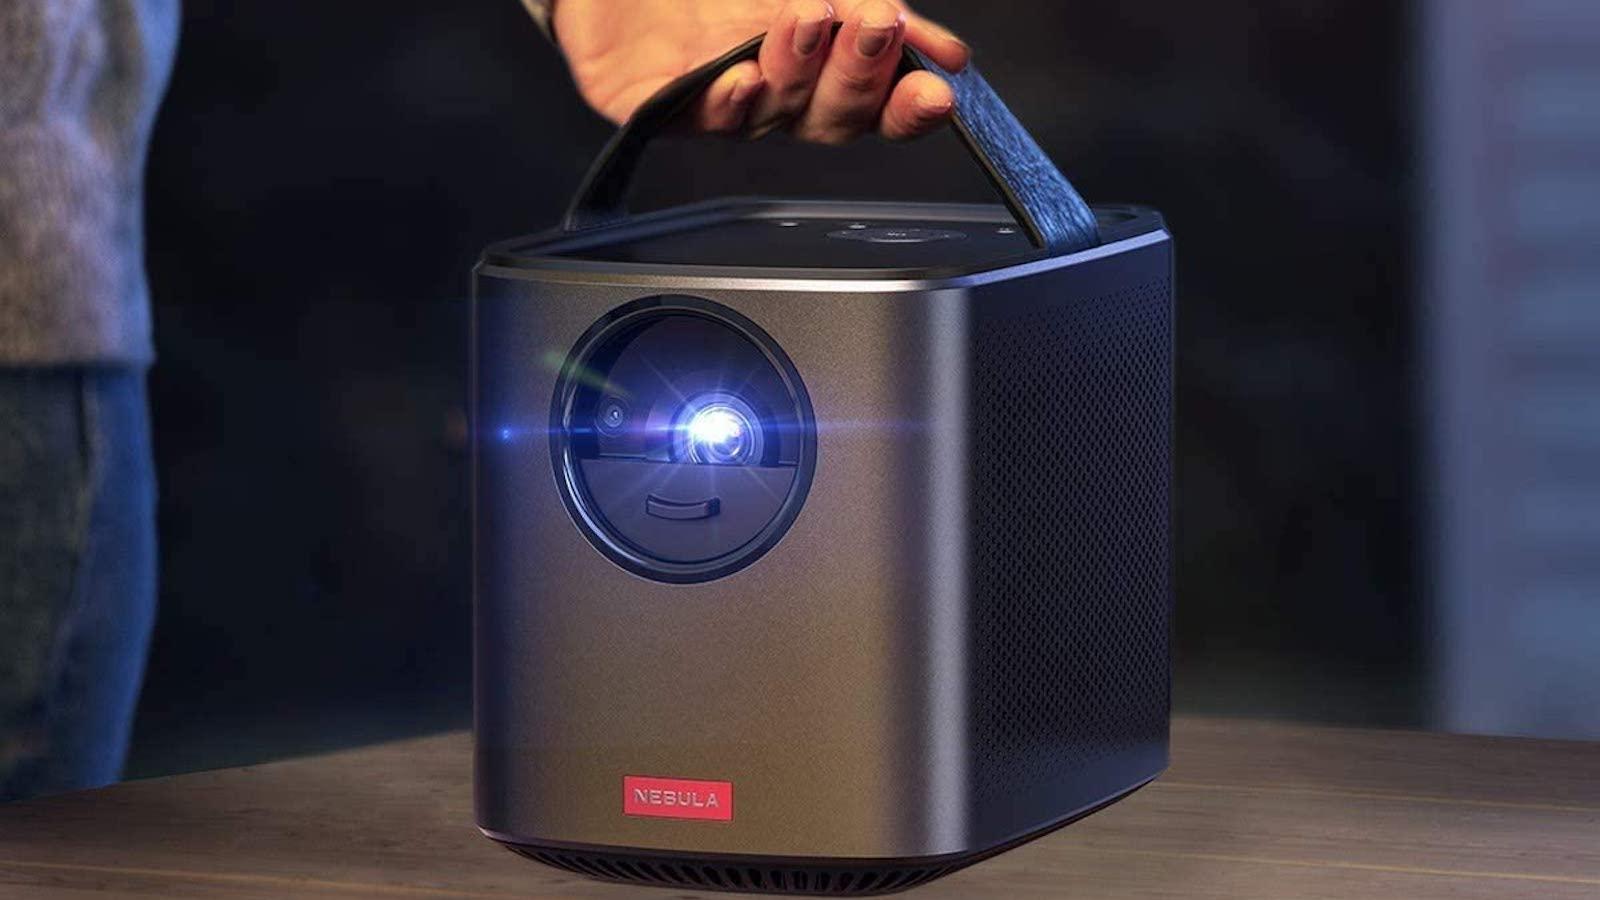 Anker Nebula Mars II Pro portable projector uses IntelliBright tech to emit 500 lumens